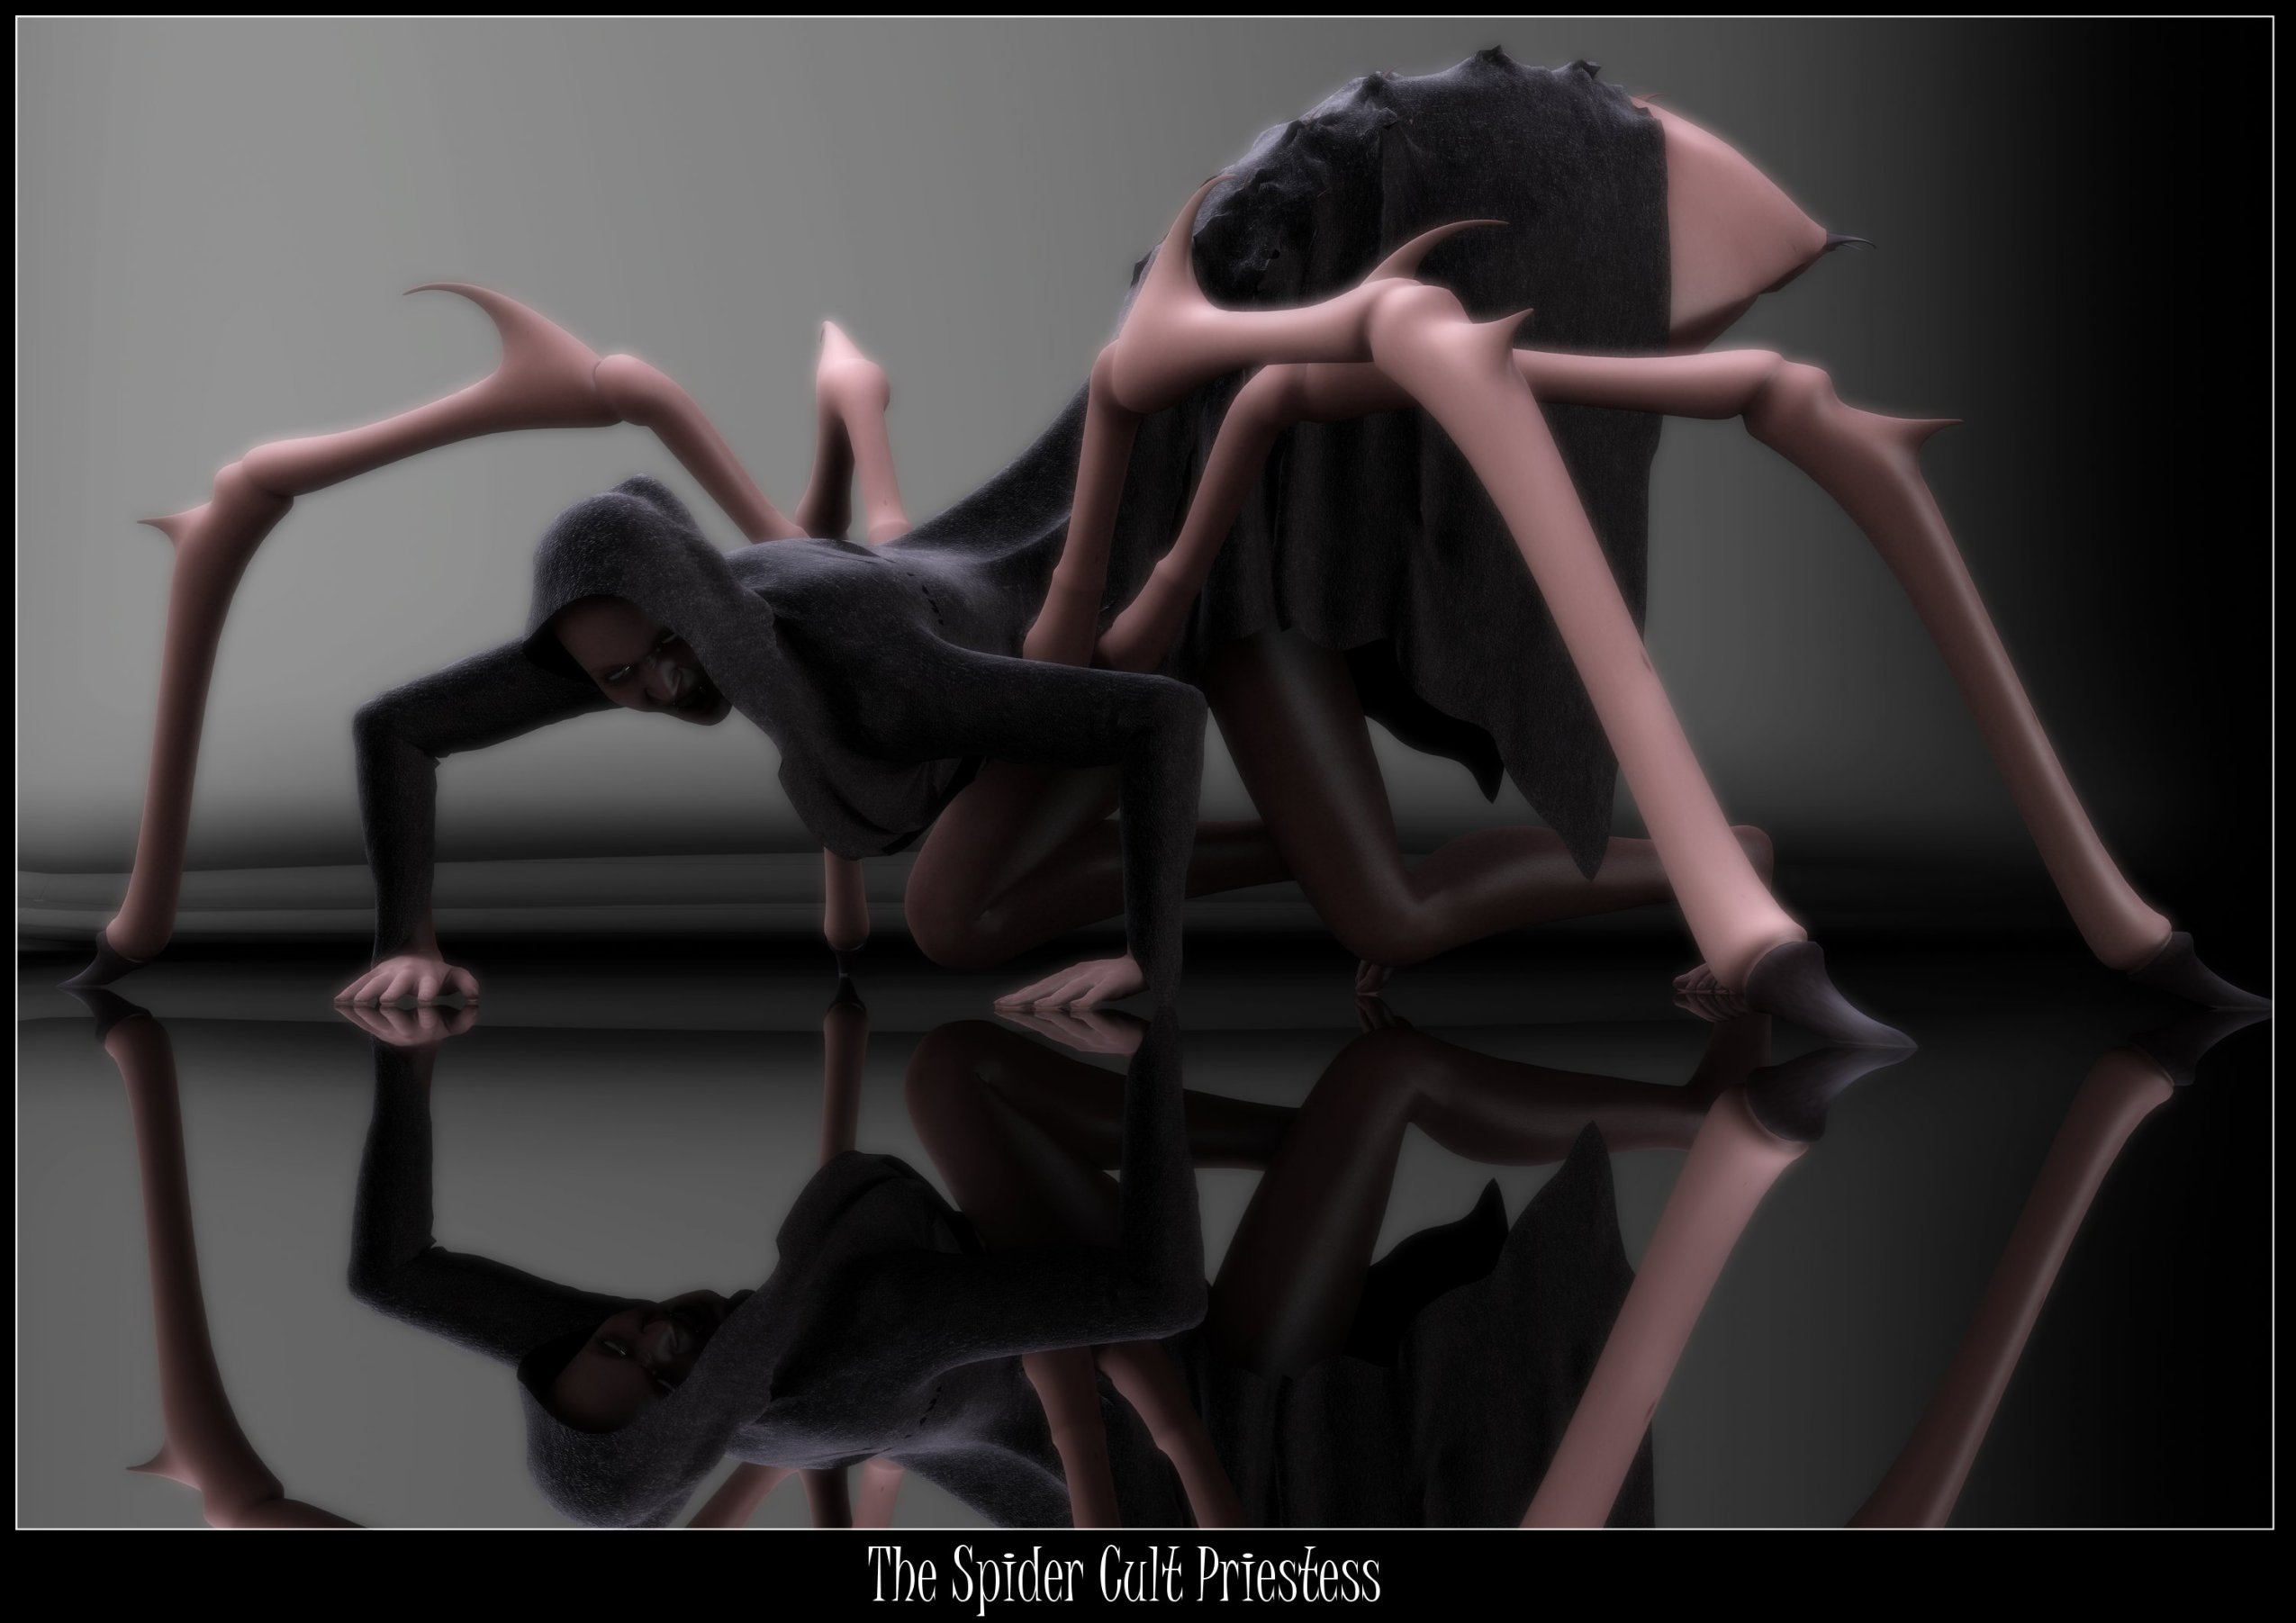 The Spider Cult Priestess